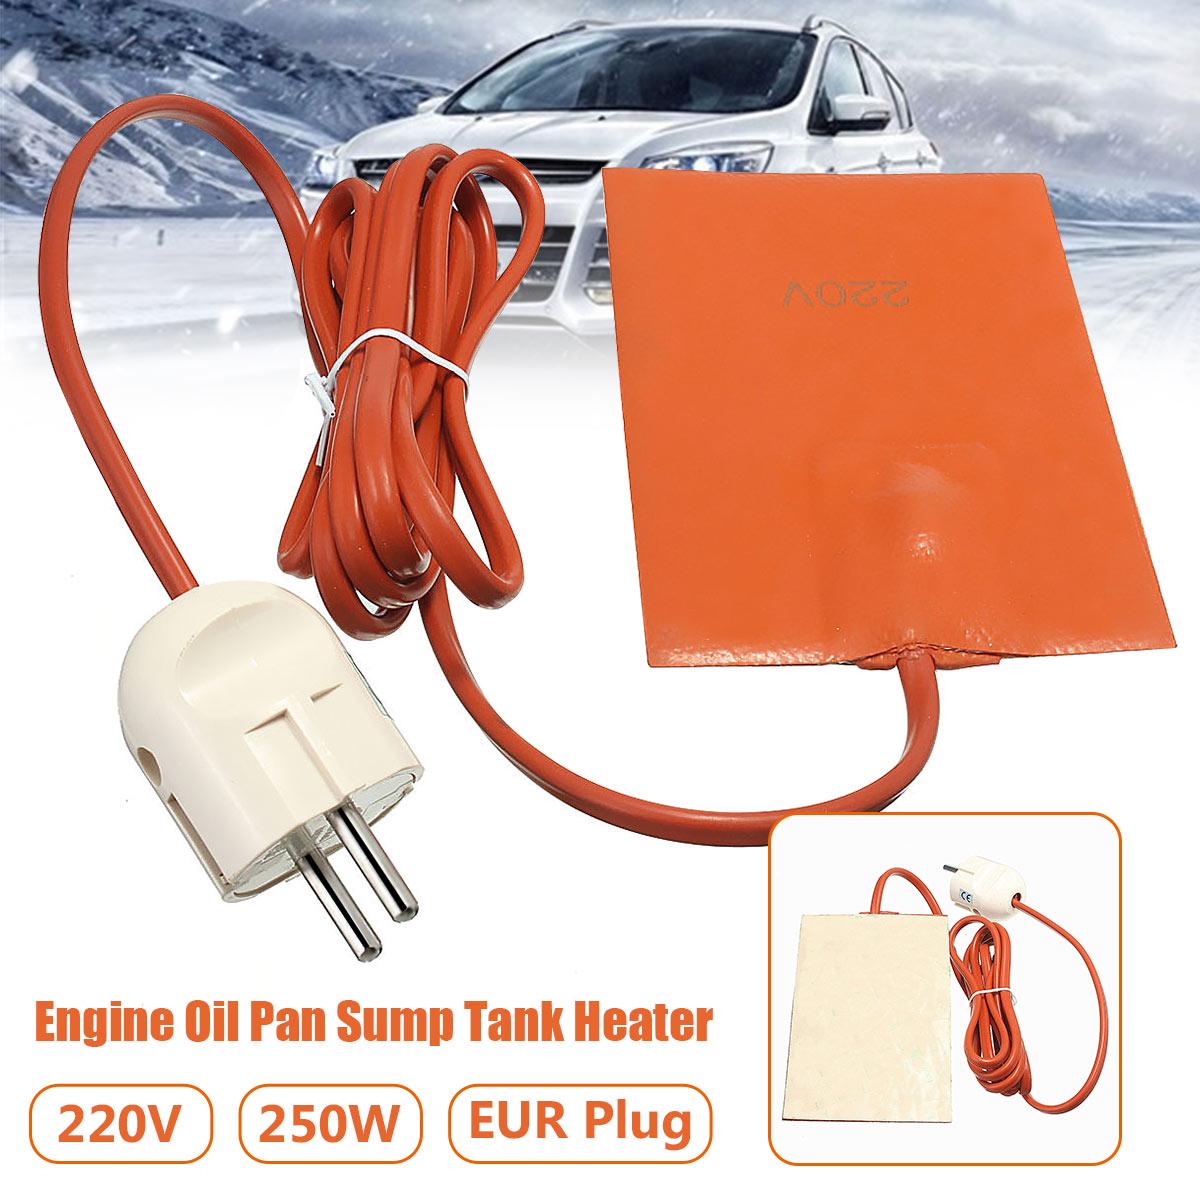 Engine Block Hydraulic Tank Heating Plate Oil Pan Sump Tank Oil Heater Pad Warming Accessoires Silicone Heater Pad,Silicone Heater Pad